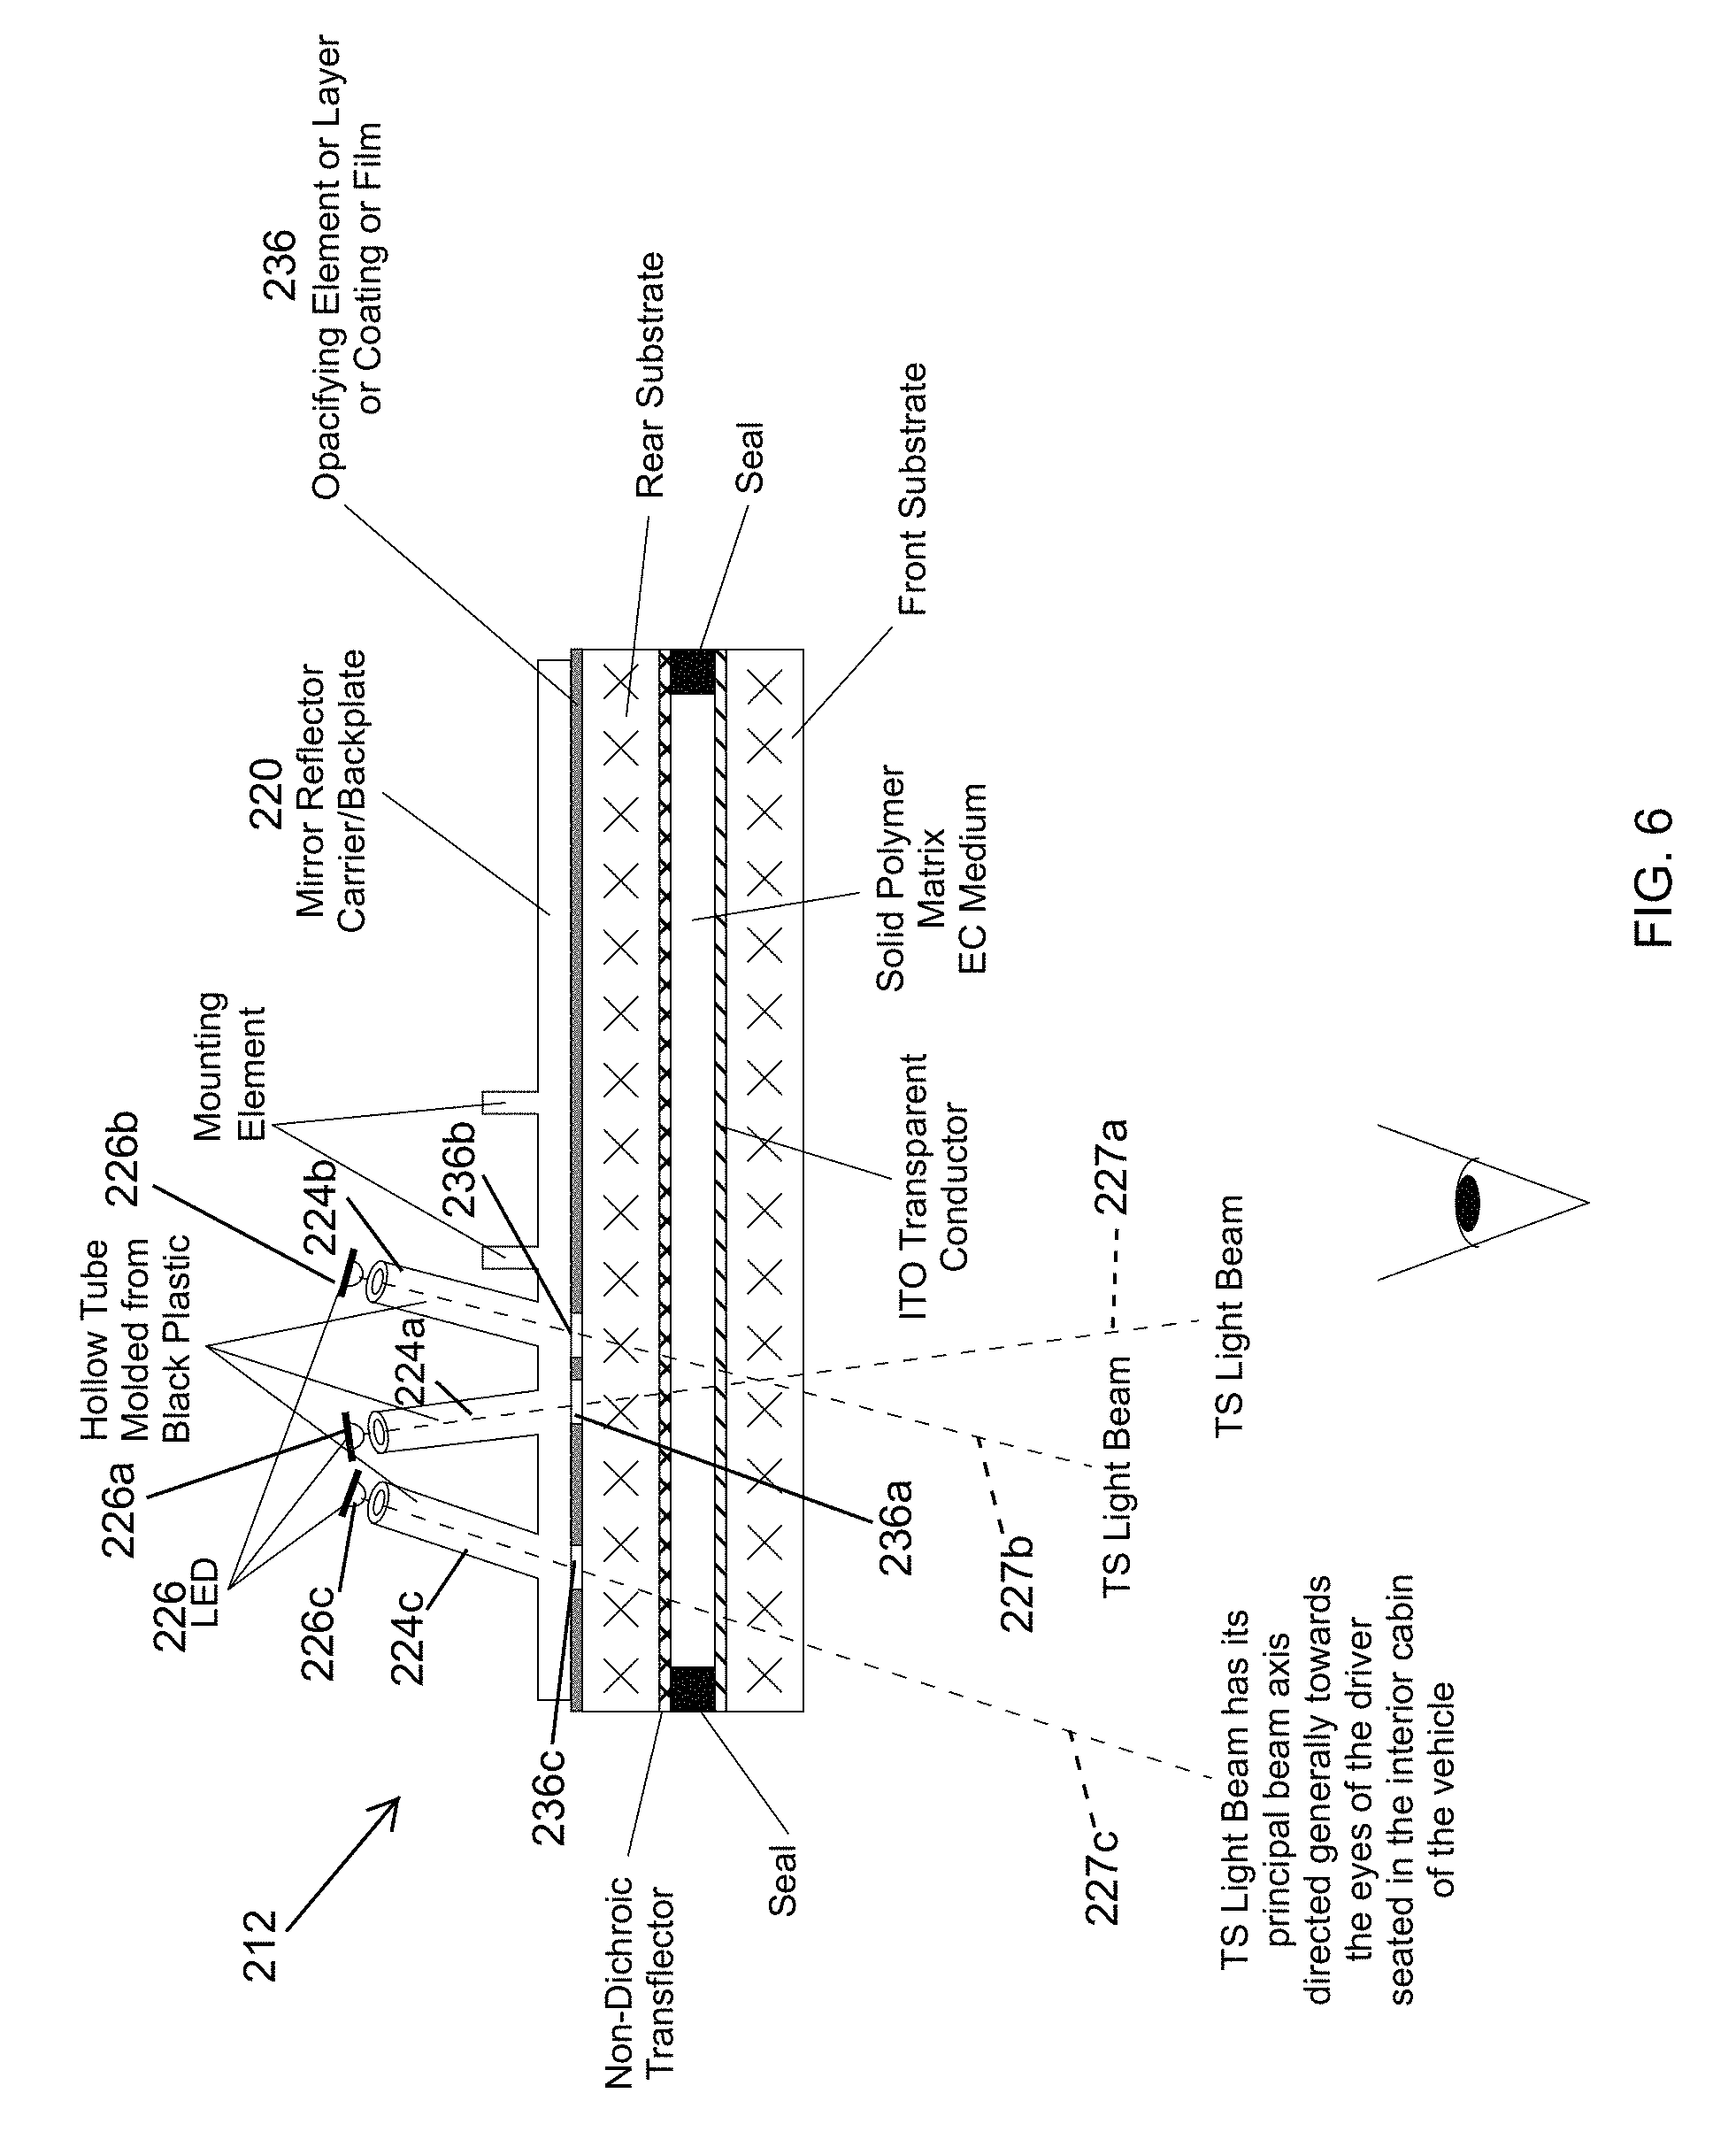 Patent Us 9758102 B1 Nissan Pathfinder Air Fuel Ratio Circuit Slow Response Bank 2 Sensor 0 Petitions